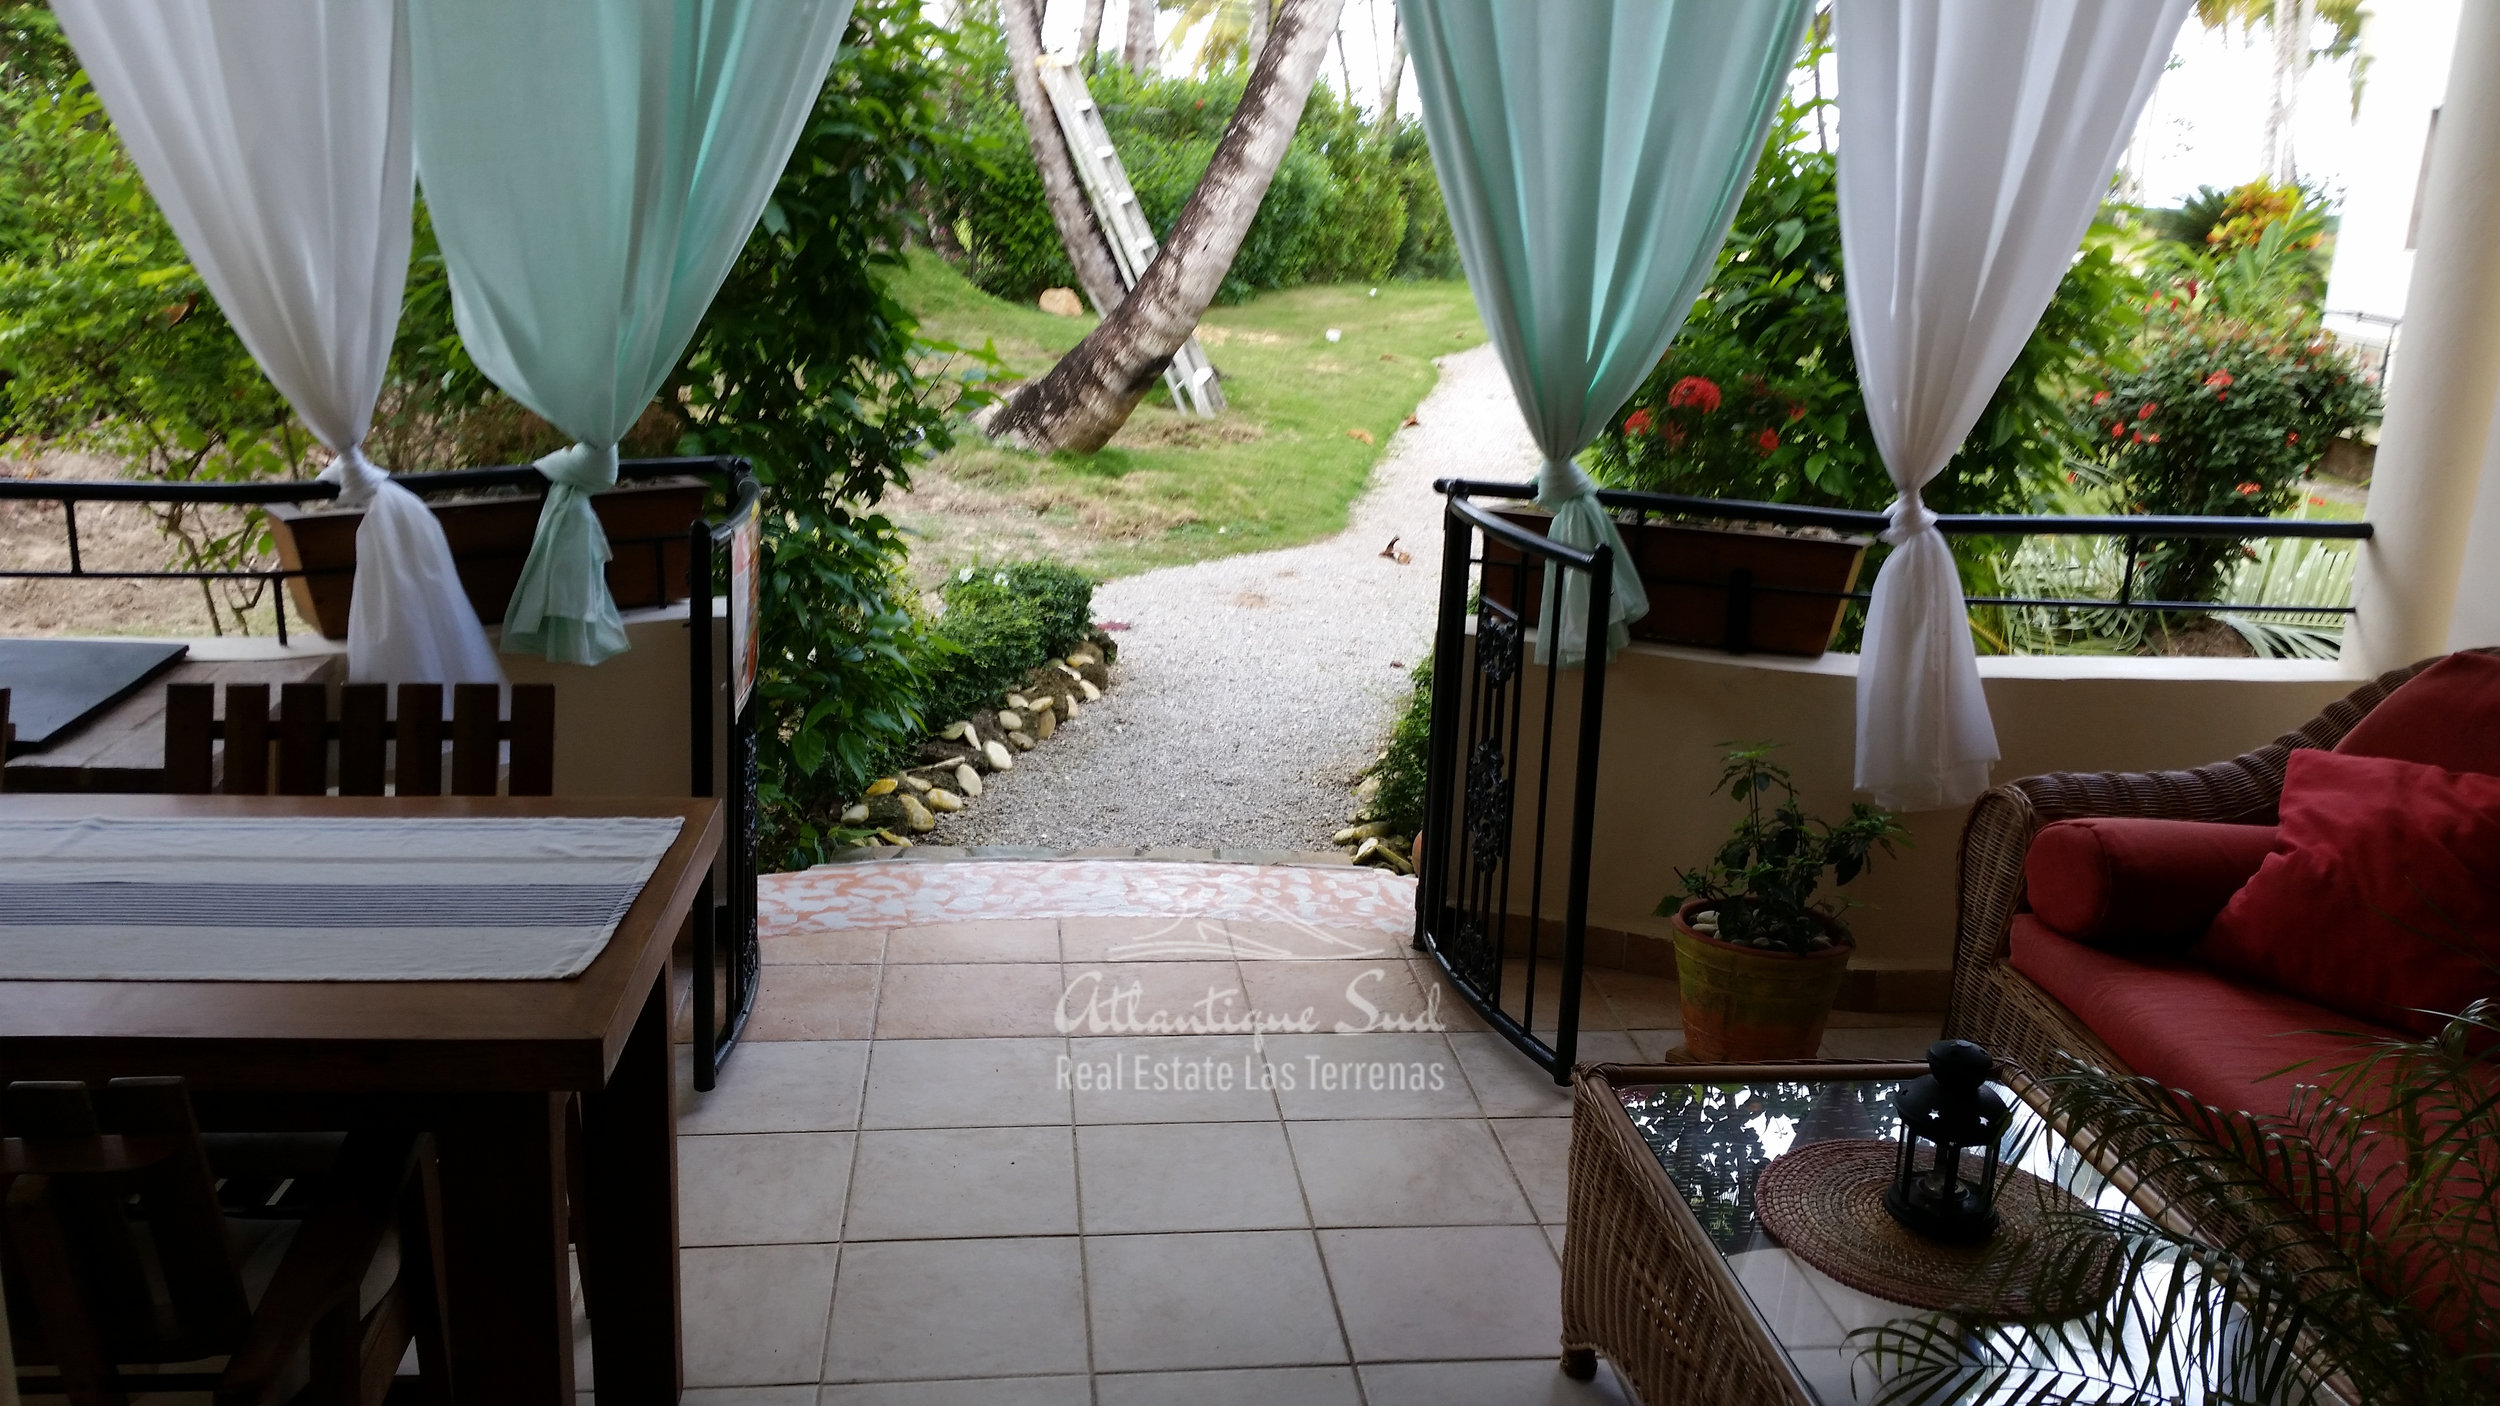 Fully-equipped condo in front of the beach Real Estate Las Terrenas Atlantique Sud Dominican Republic3.jpg